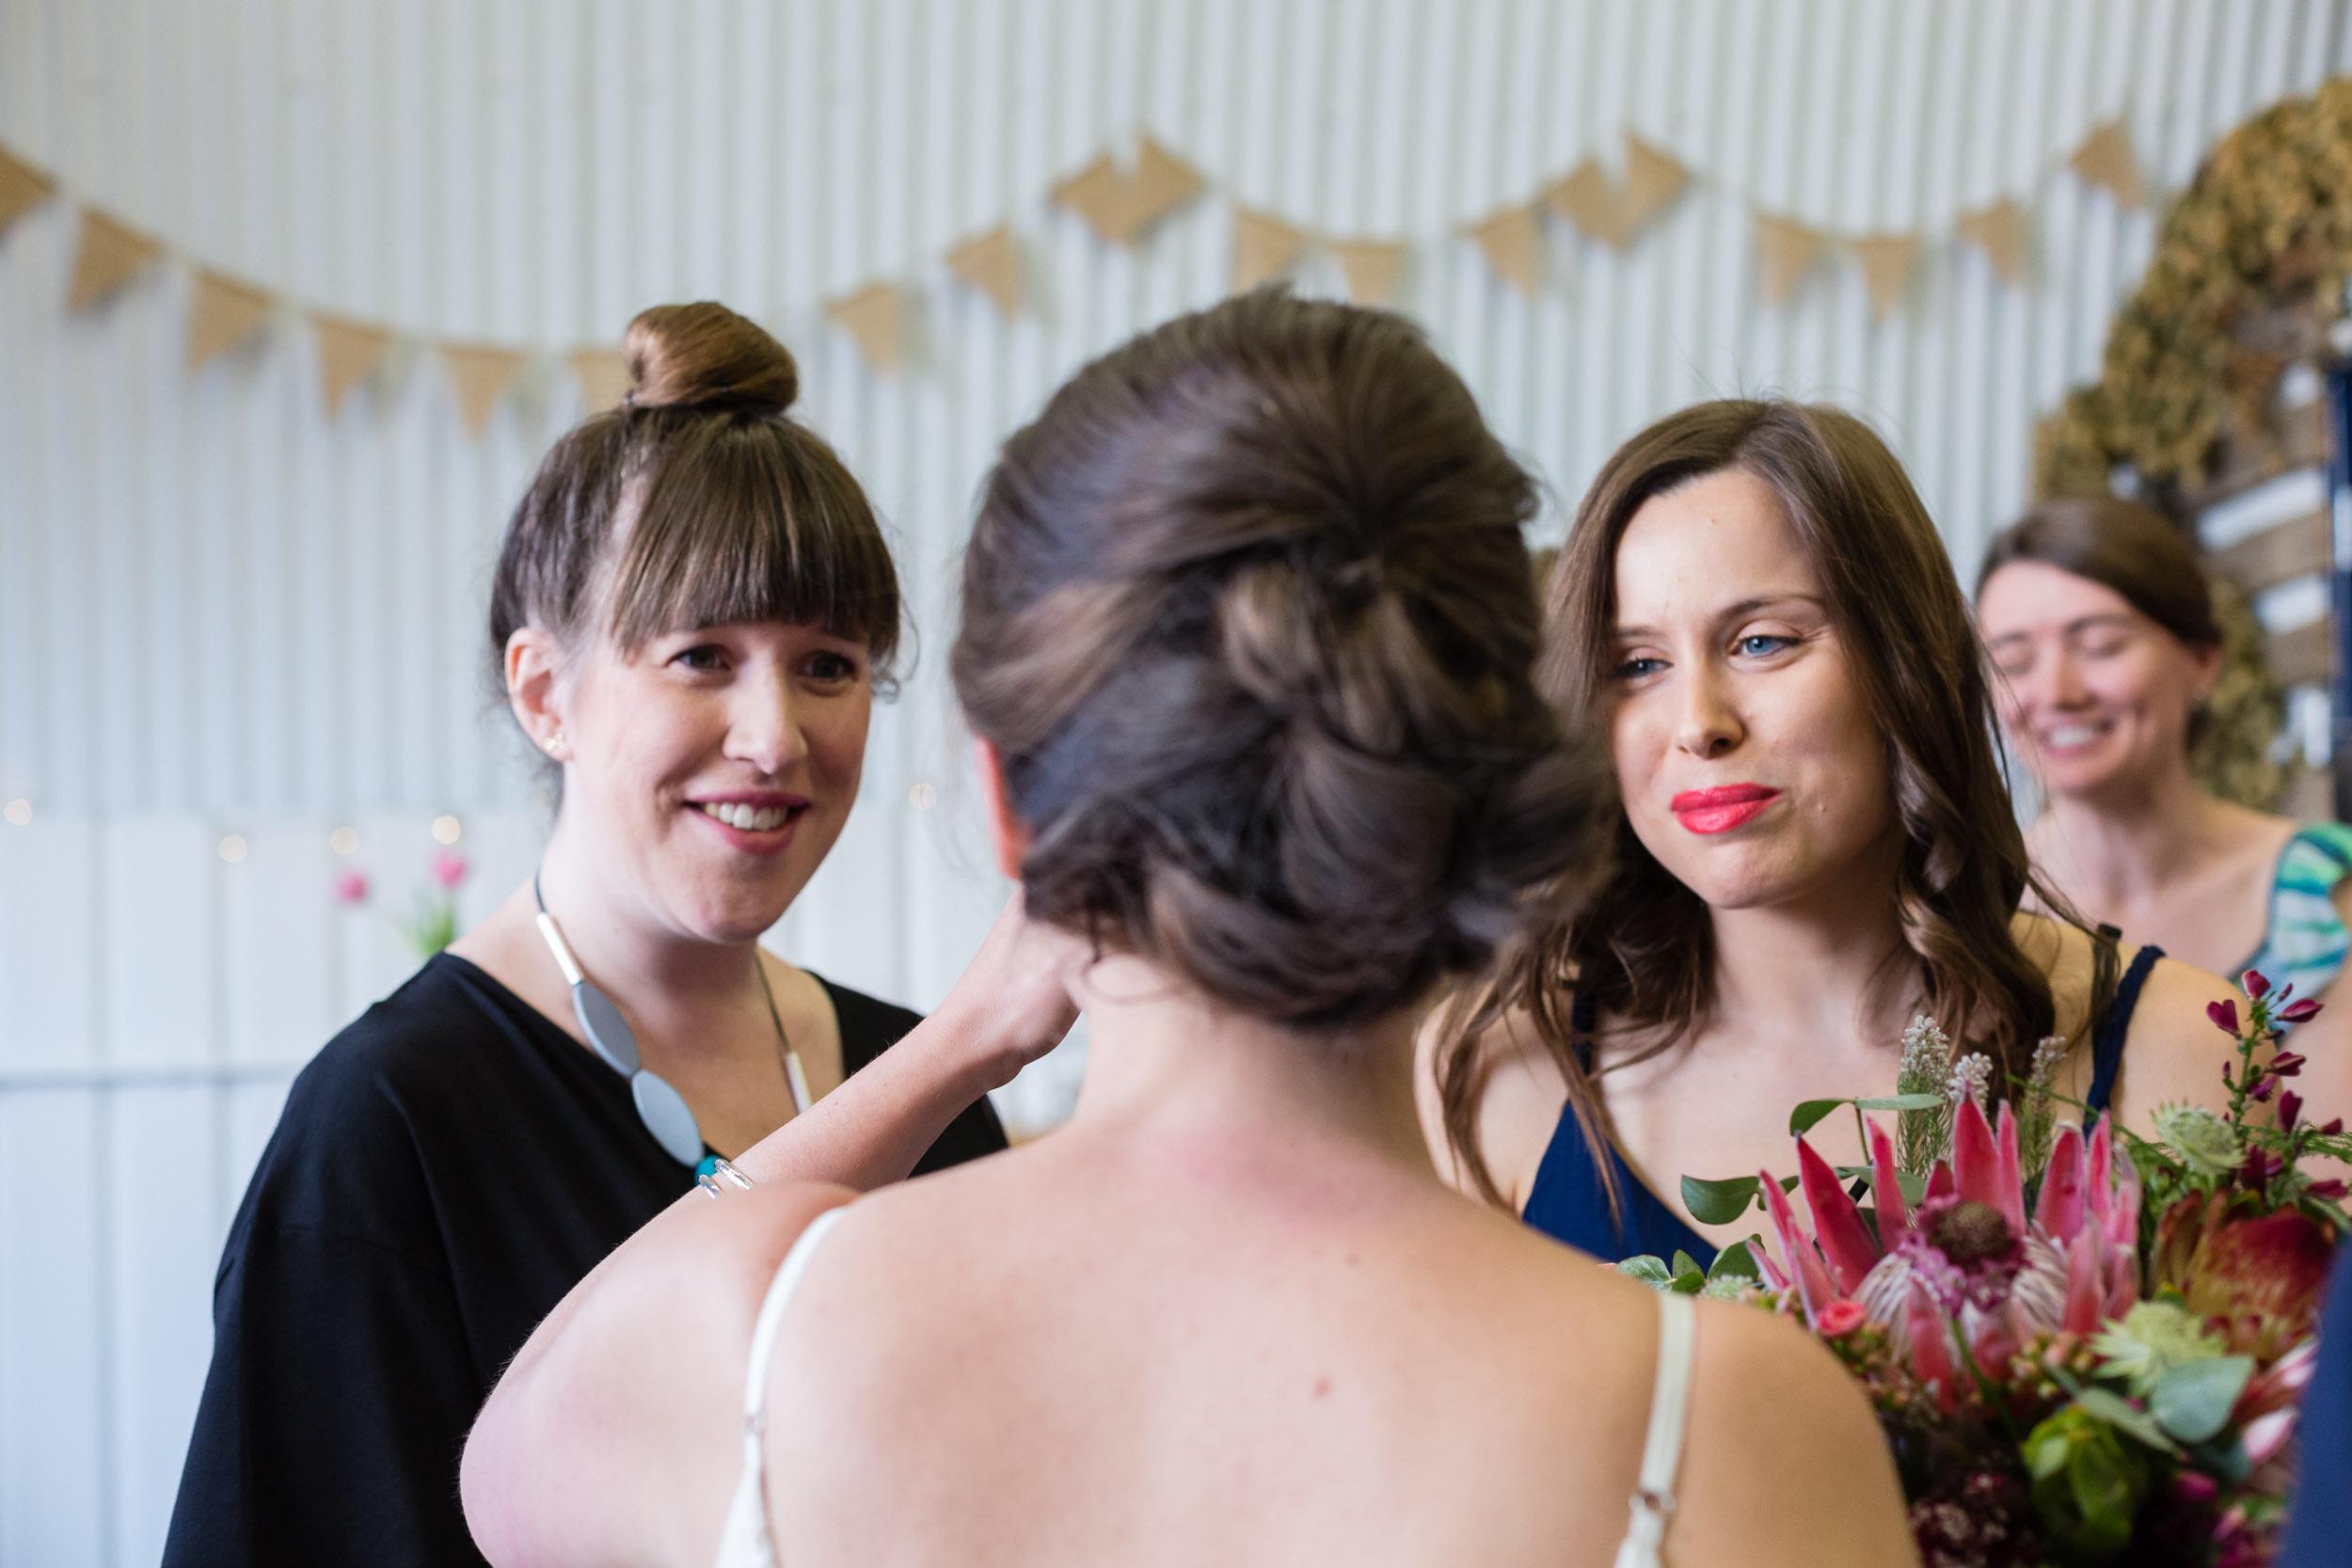 brockwell-lido-brixton-herne-hill-wedding-079.jpg